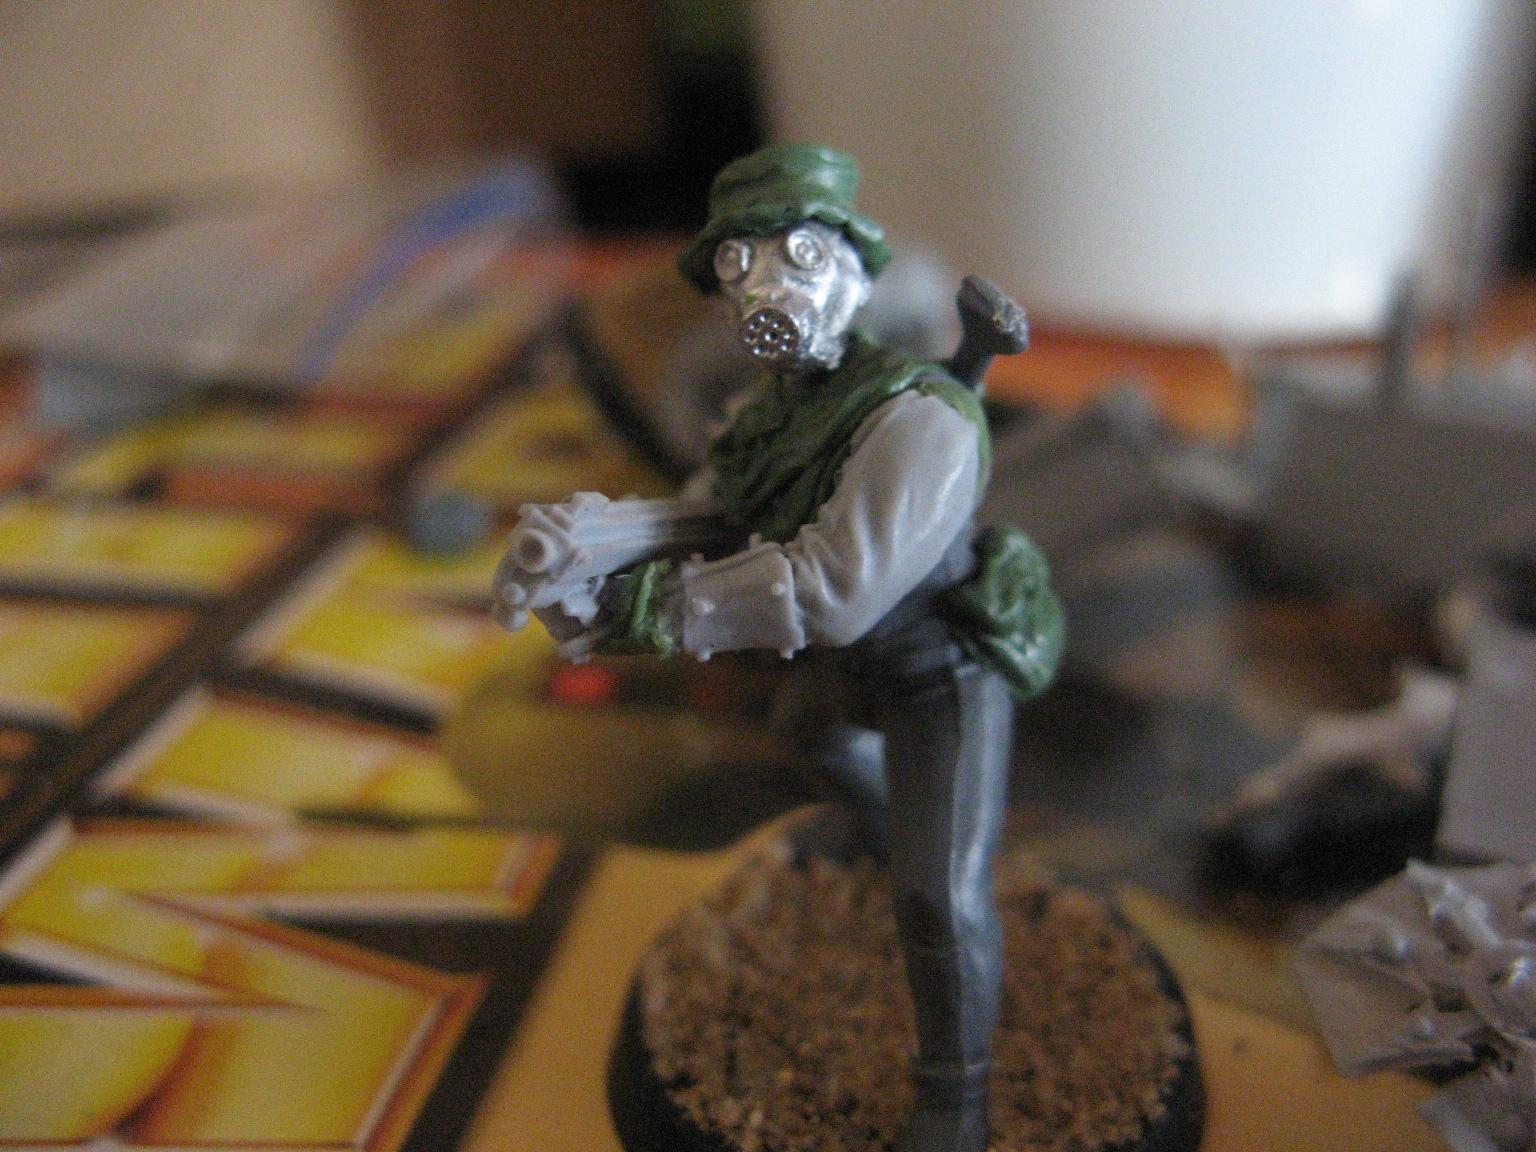 waster with combat shotgun